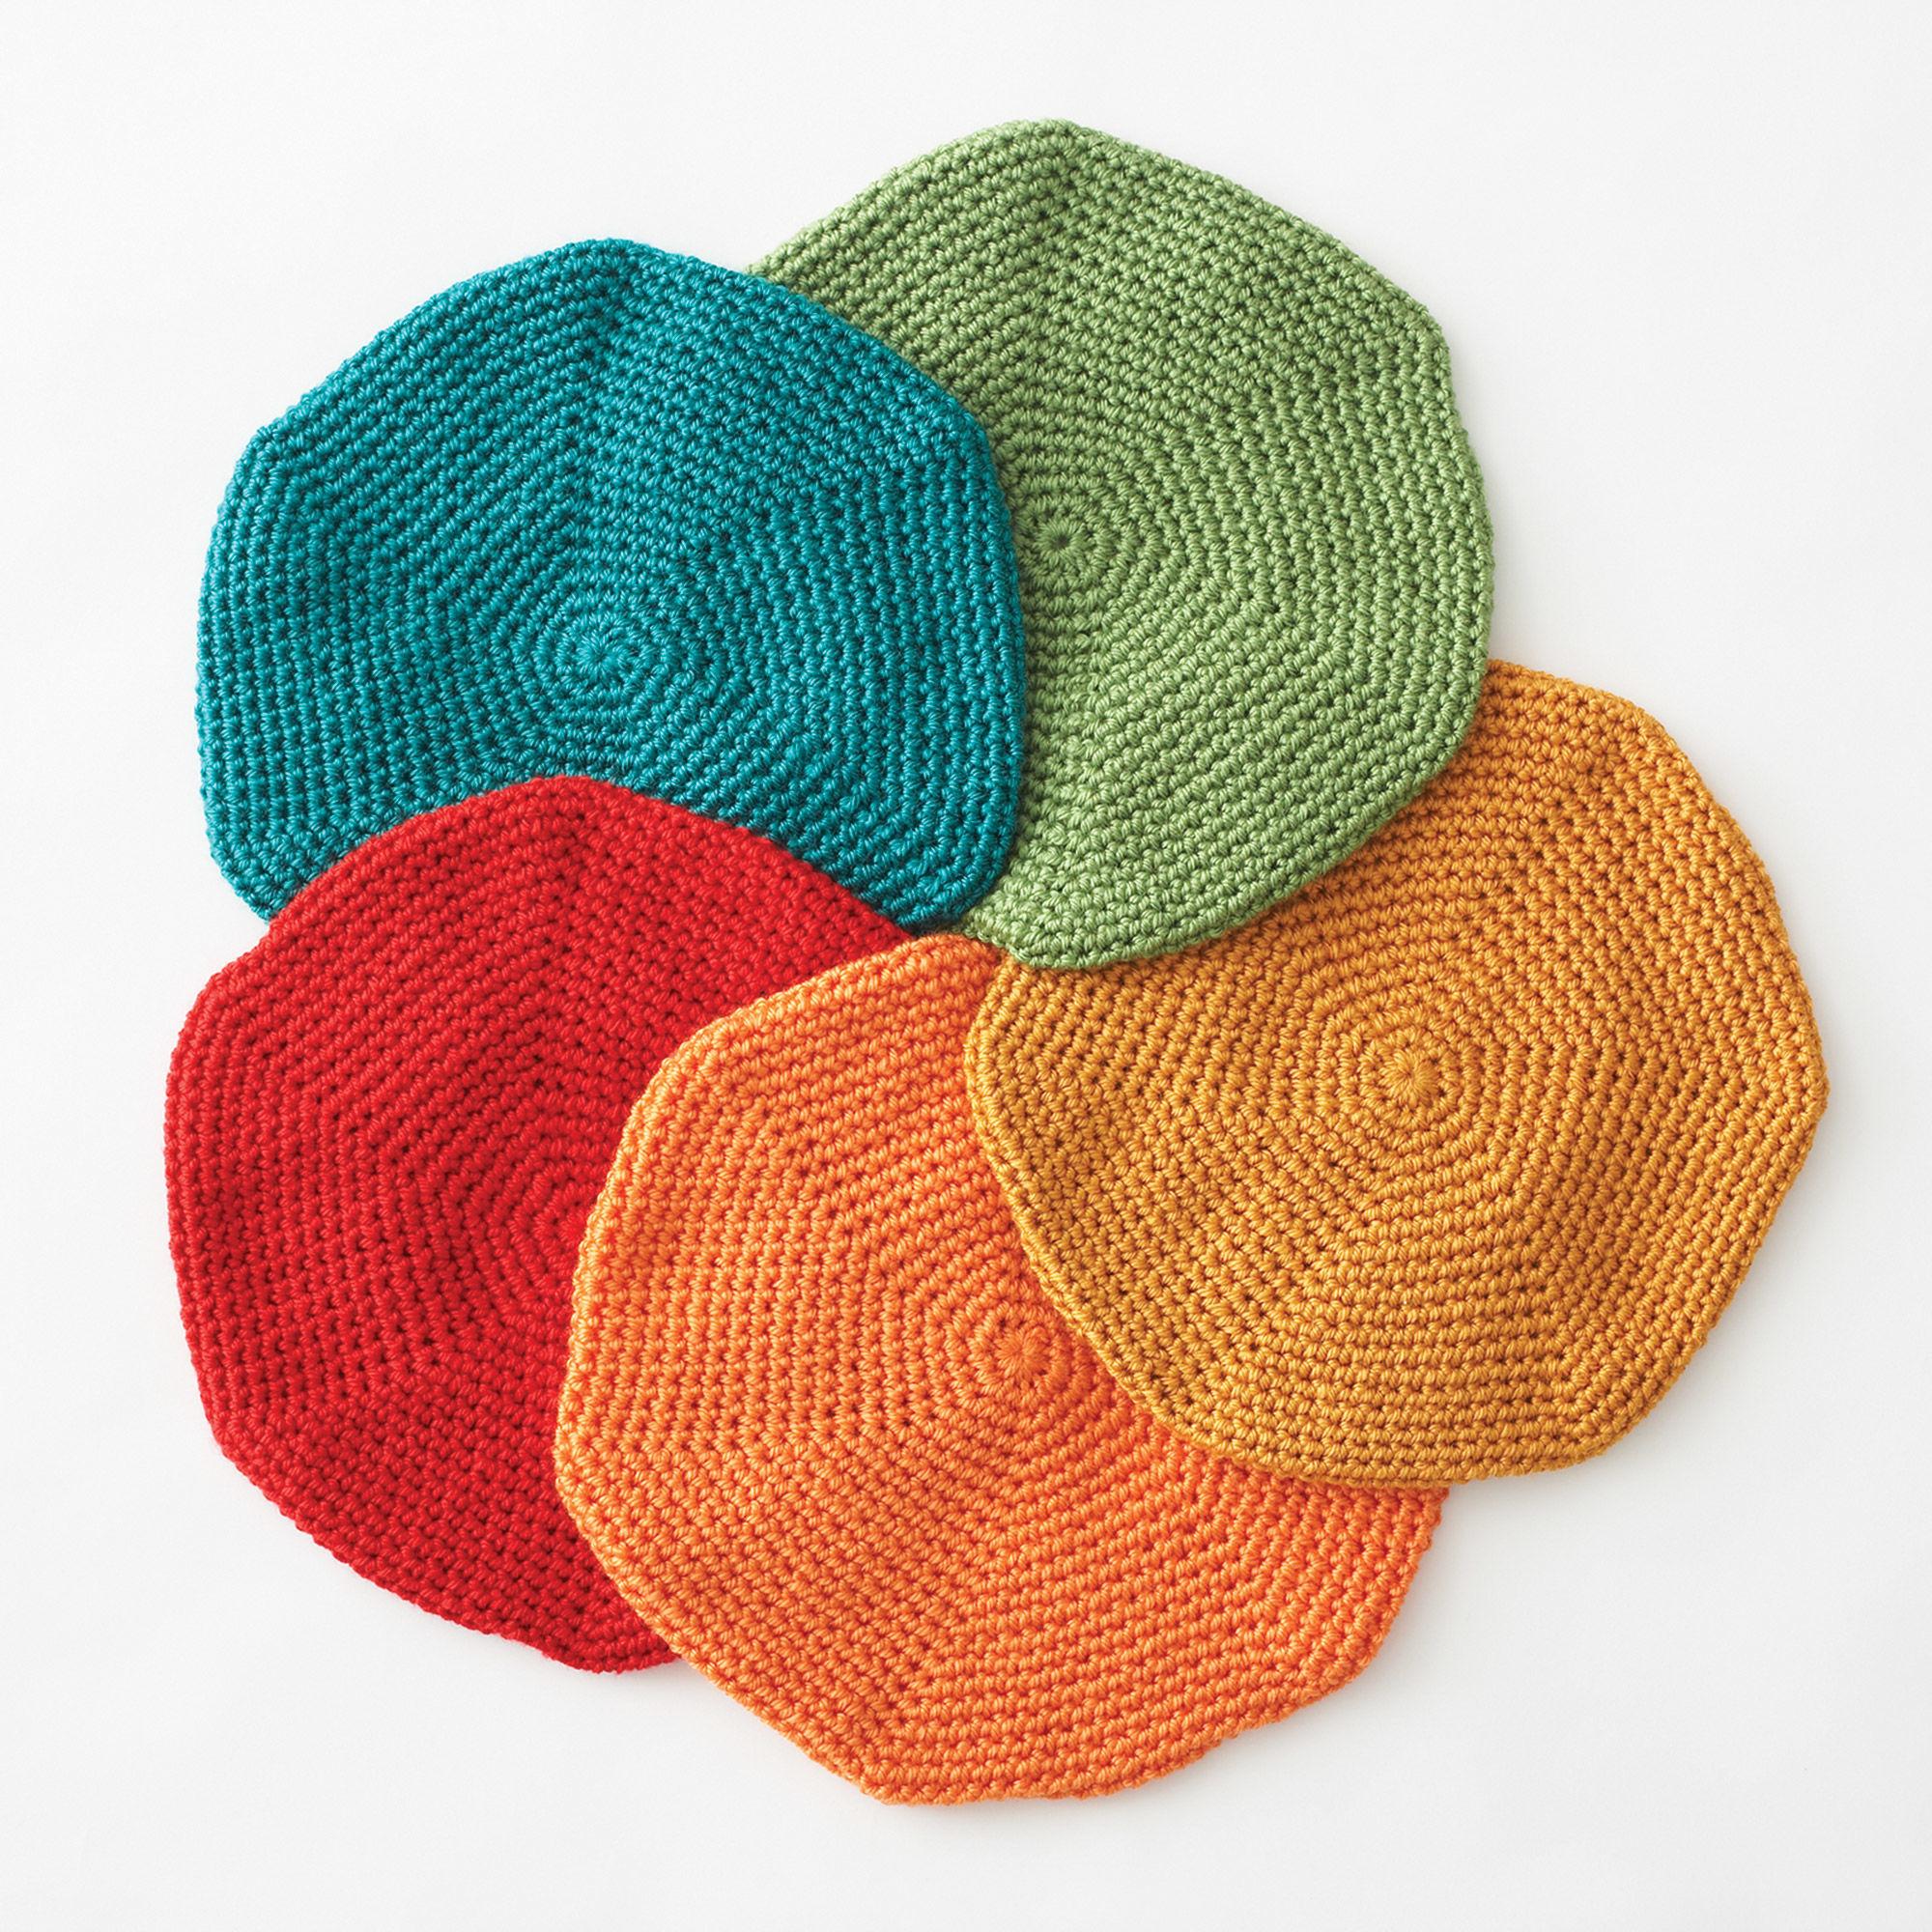 Bernat Classic Crochet Beret, Foliage | Yarnspirations